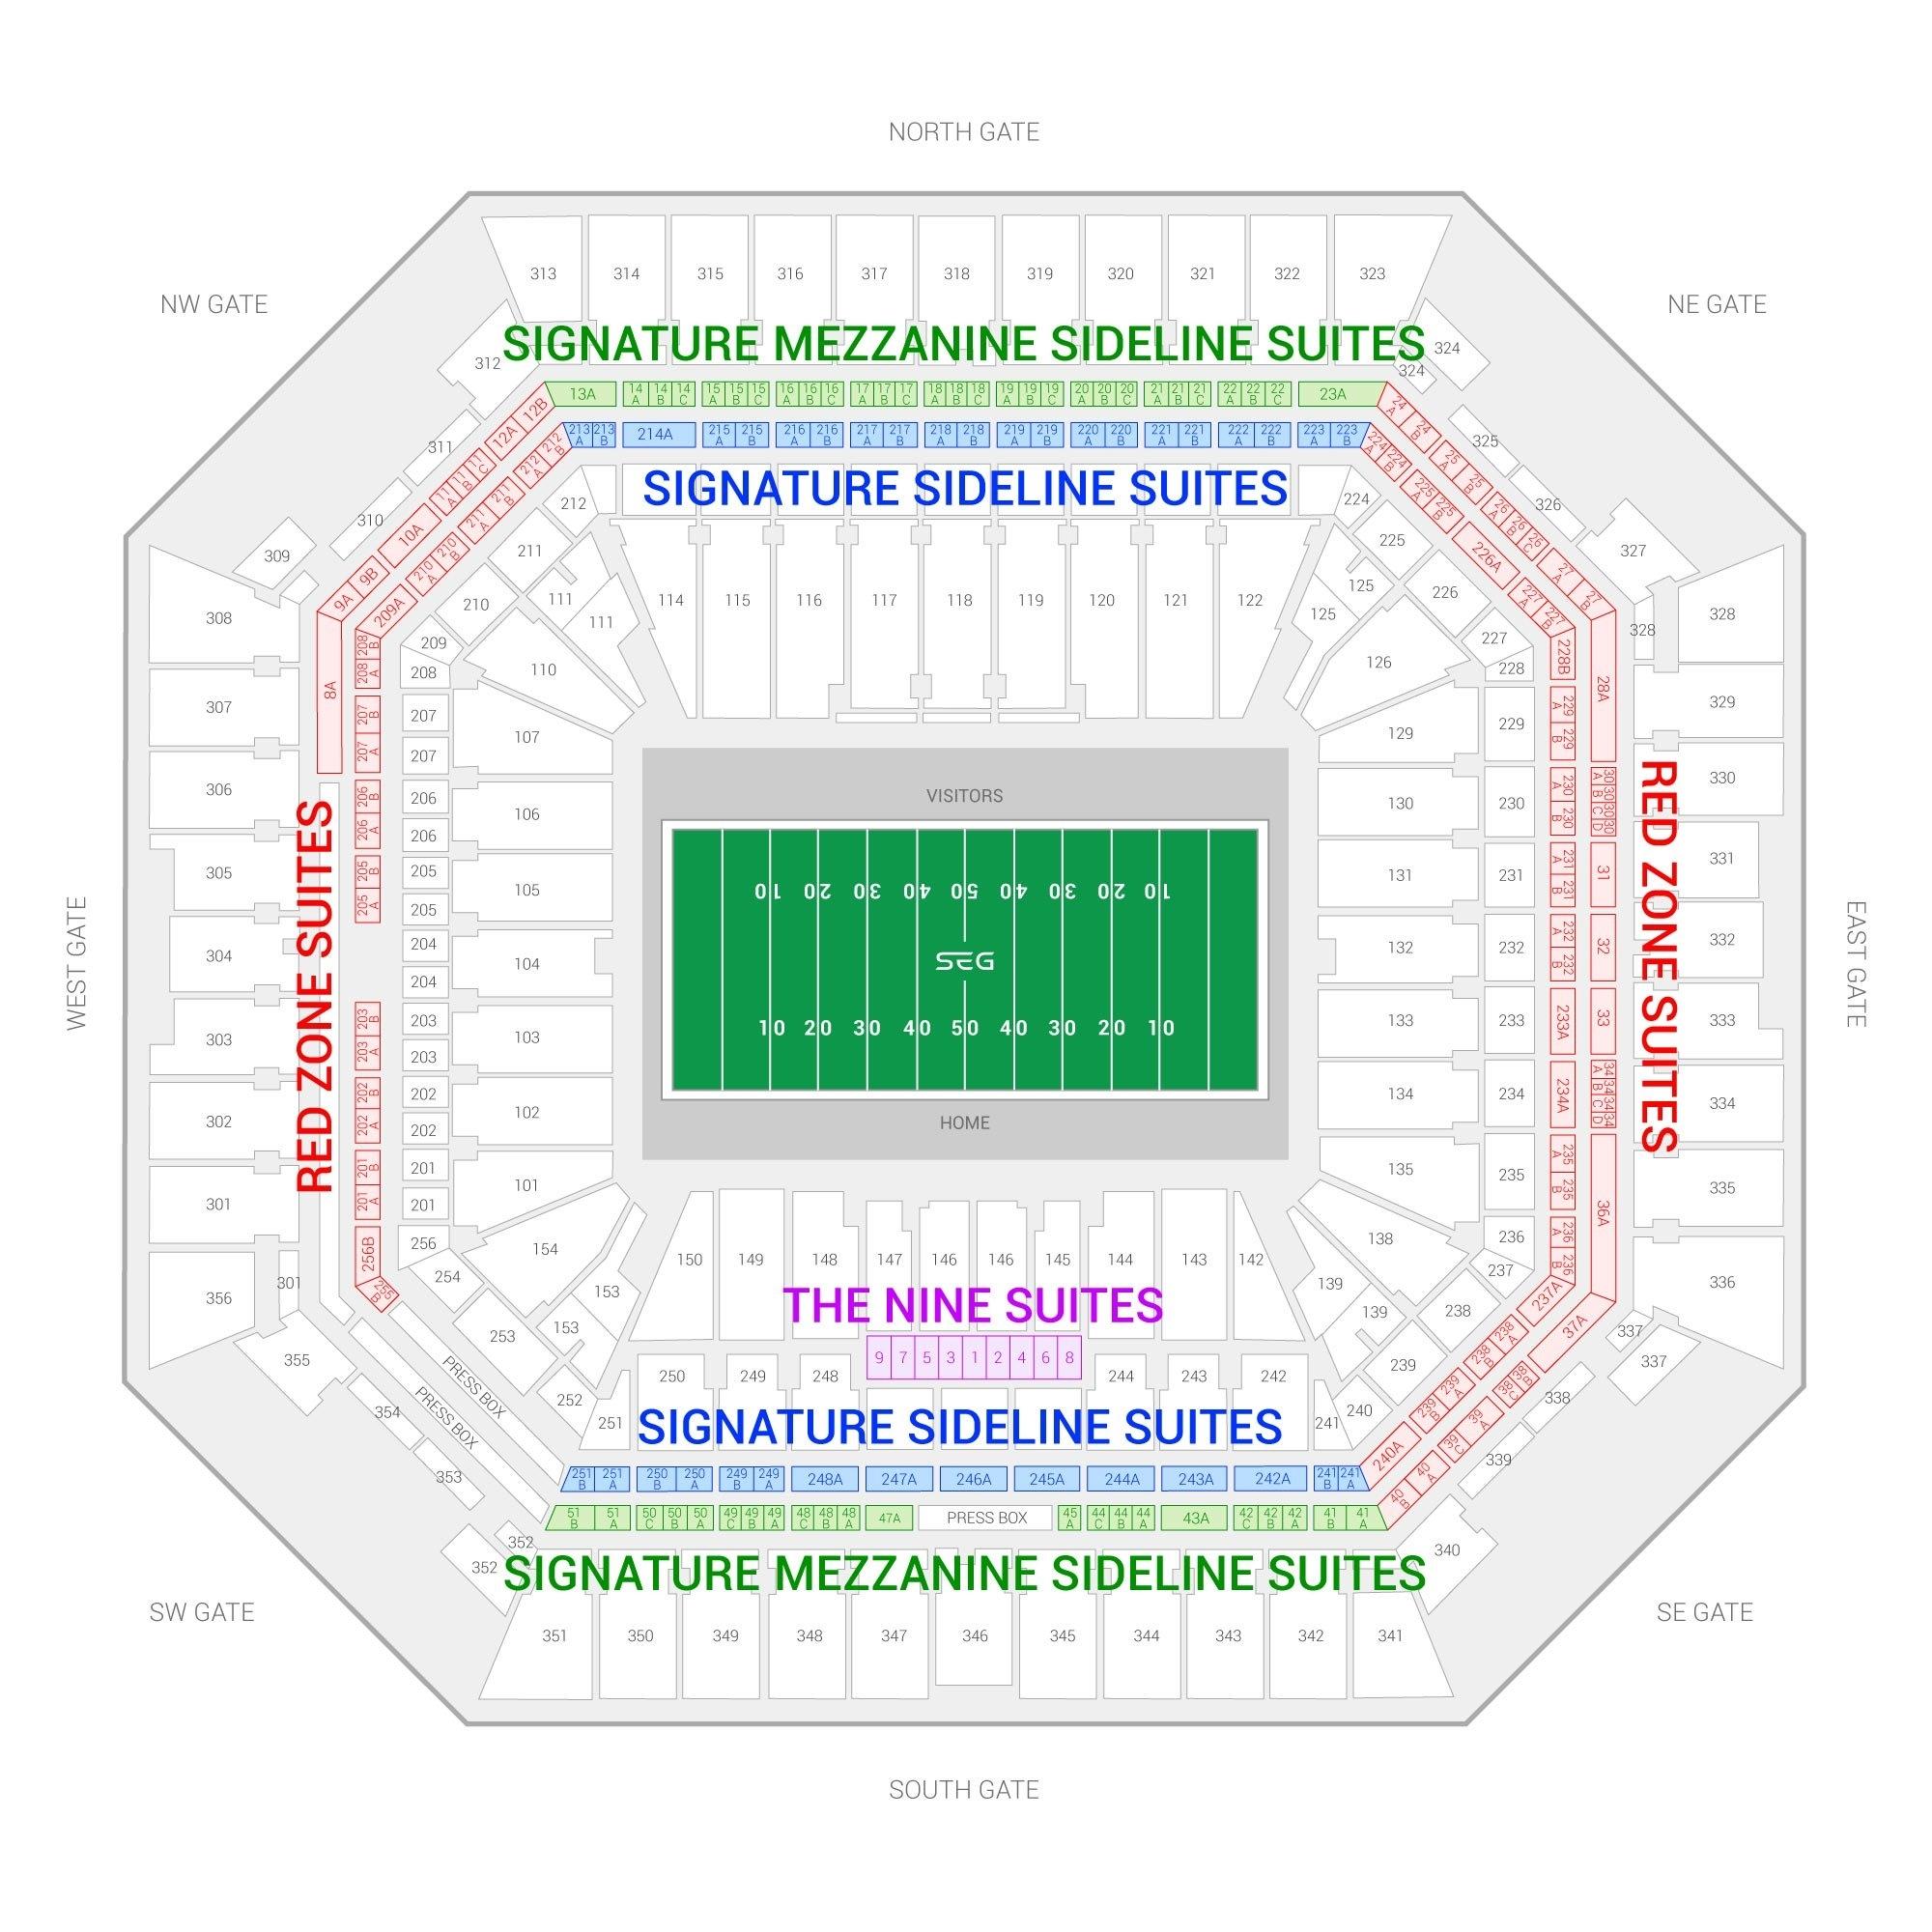 Super Bowl Liv Suite Rentals | Hard Rock Stadium regarding Super Bowl Seating Capacity Requirements